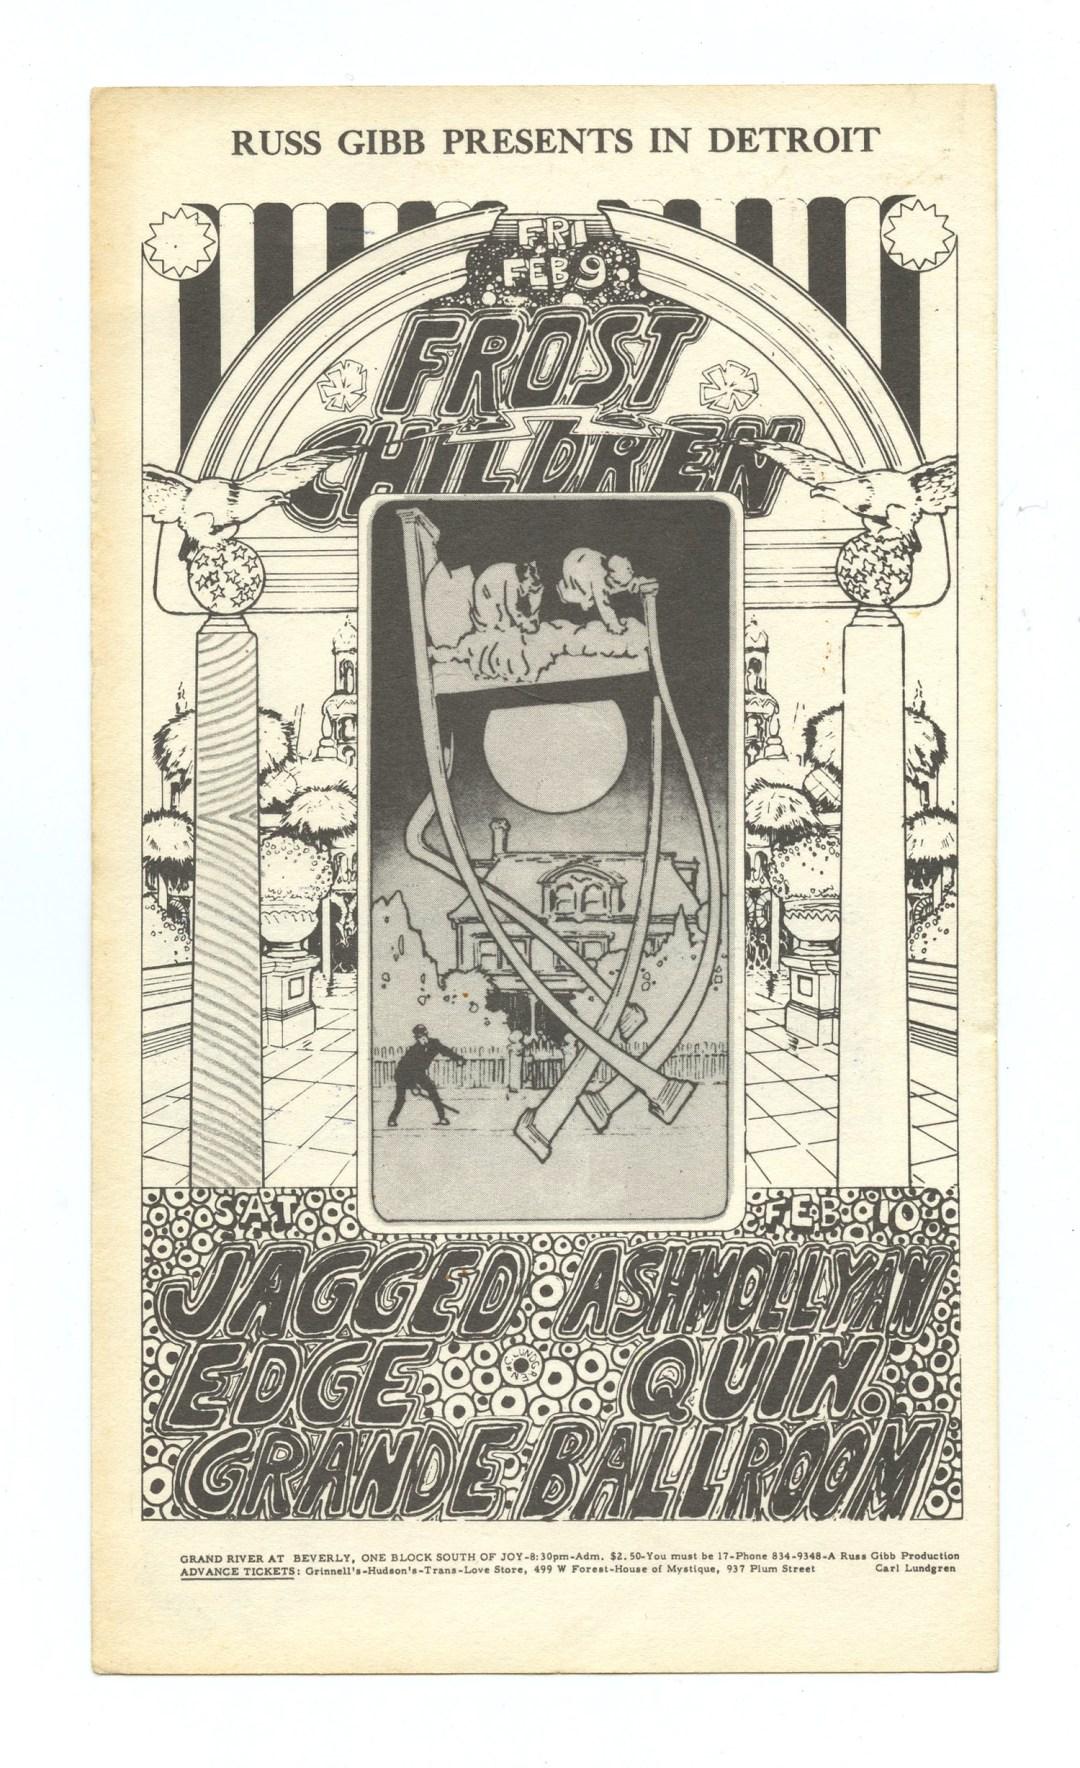 Grande Ballroom 1968 Feb 9 Postcard Frost Children Jagged Edge Ashmollyan Quintet